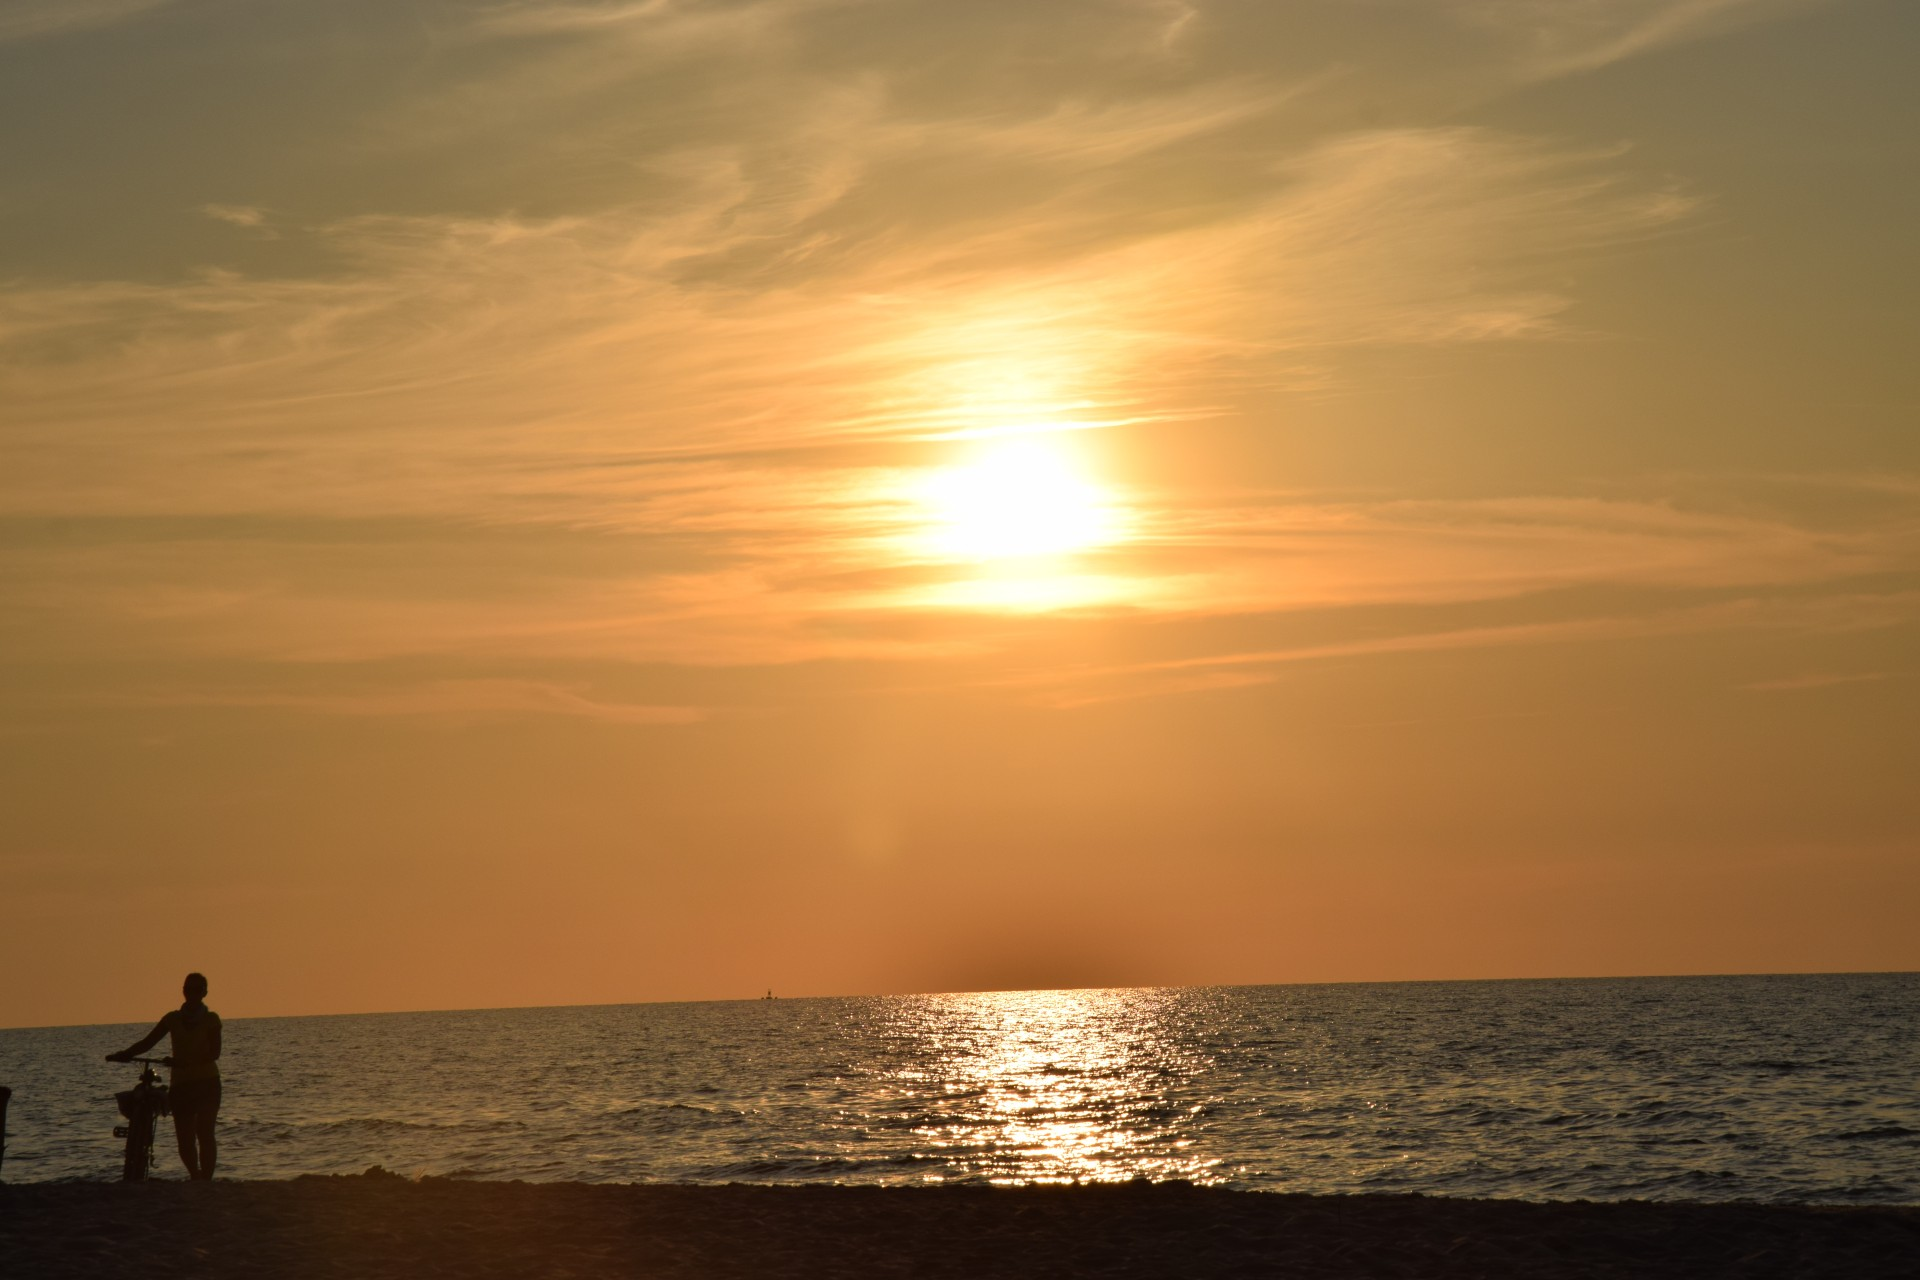 Kopalino, plaża. Nieopowiedziane historie [FOTOREPORTAŻ] 3